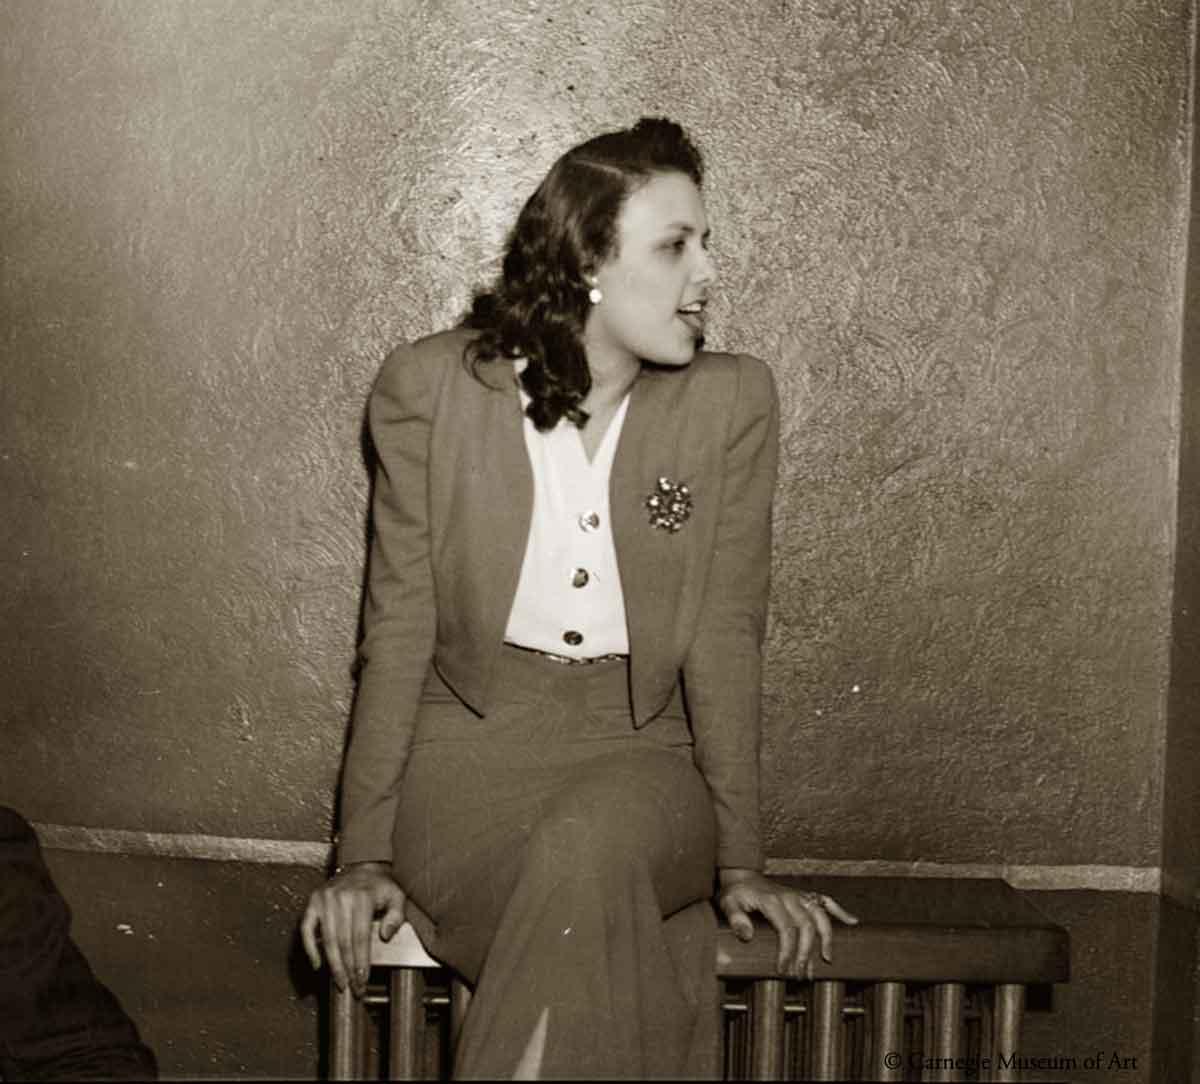 Lena-Horne-1941---Teenie-Harris